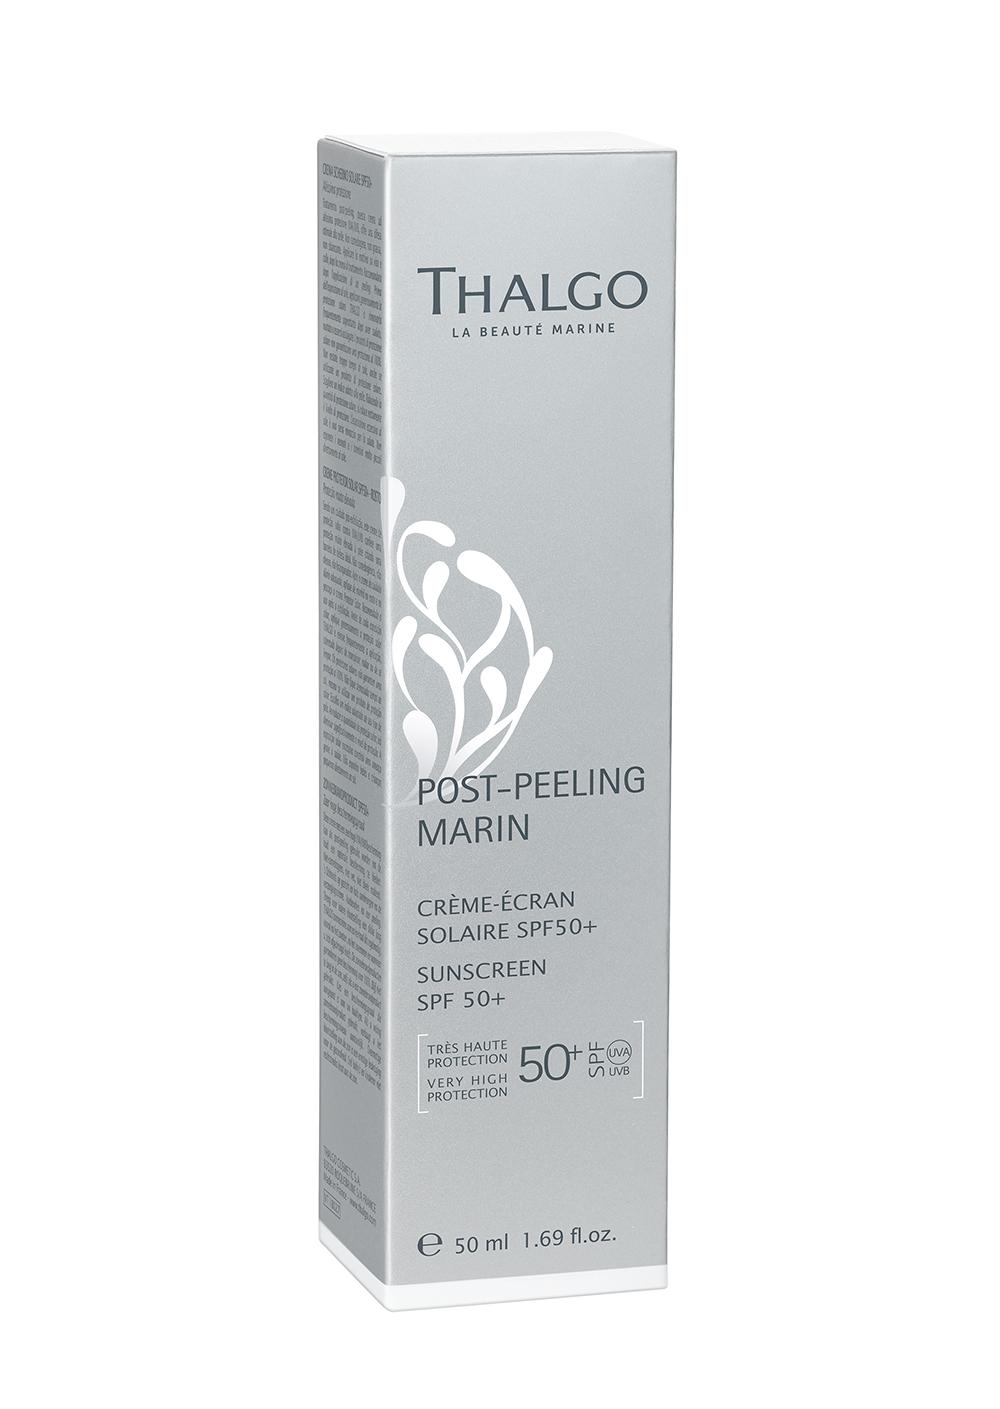 Thalgo PEELING MARIN Солнцезащитный Крем-экран SPF50